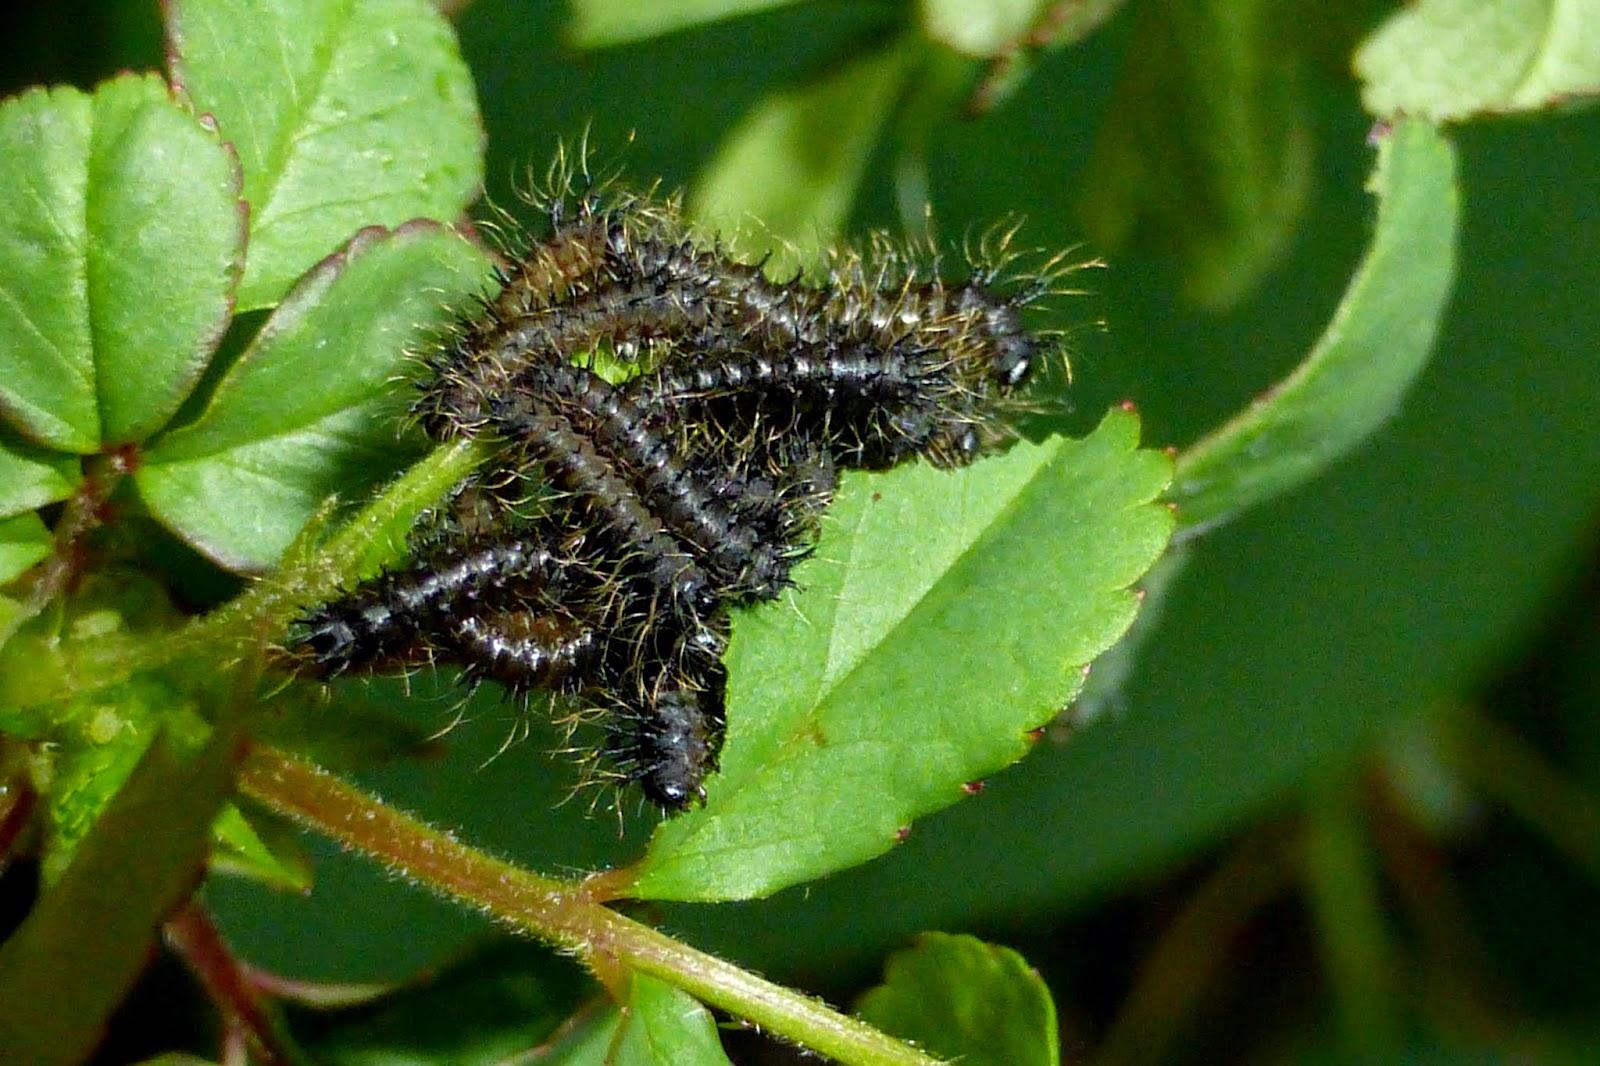 Hemileuca eglanterina caterpillar